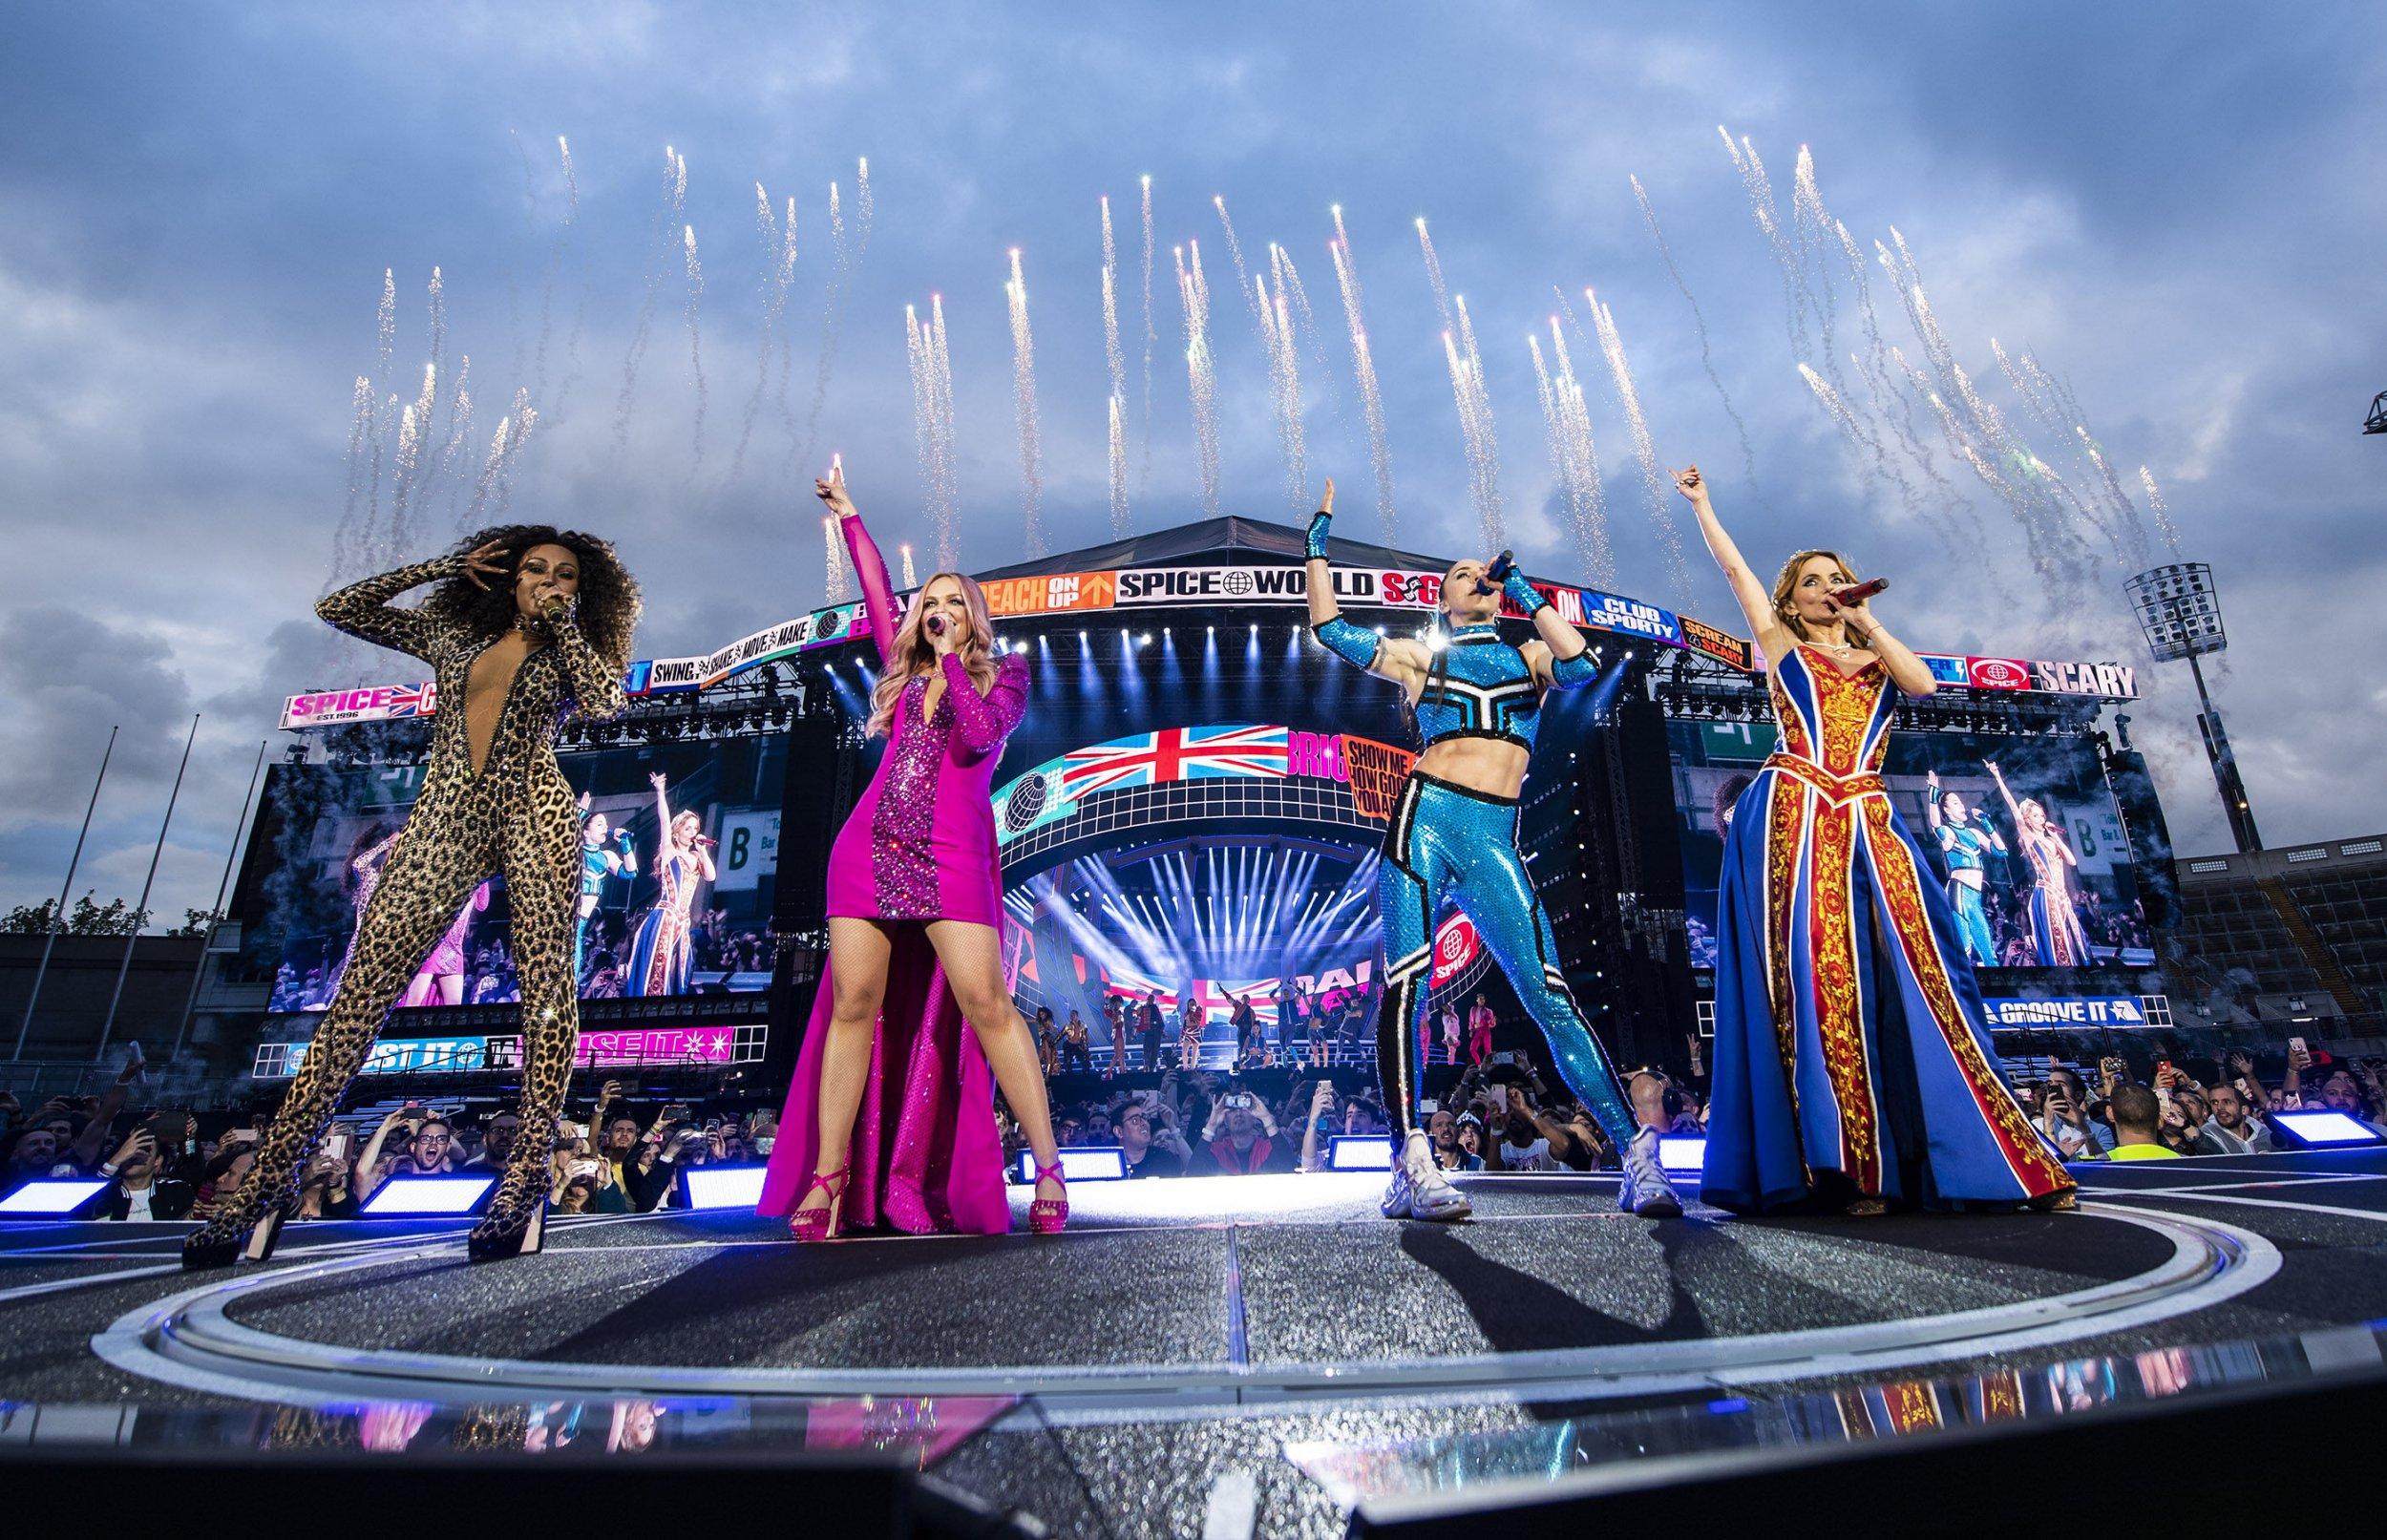 Melanie Brown, Emma Bunton, Melanie Chisholm and Geri Horner of a Spice Girls in unison during Croke Park in Dublin